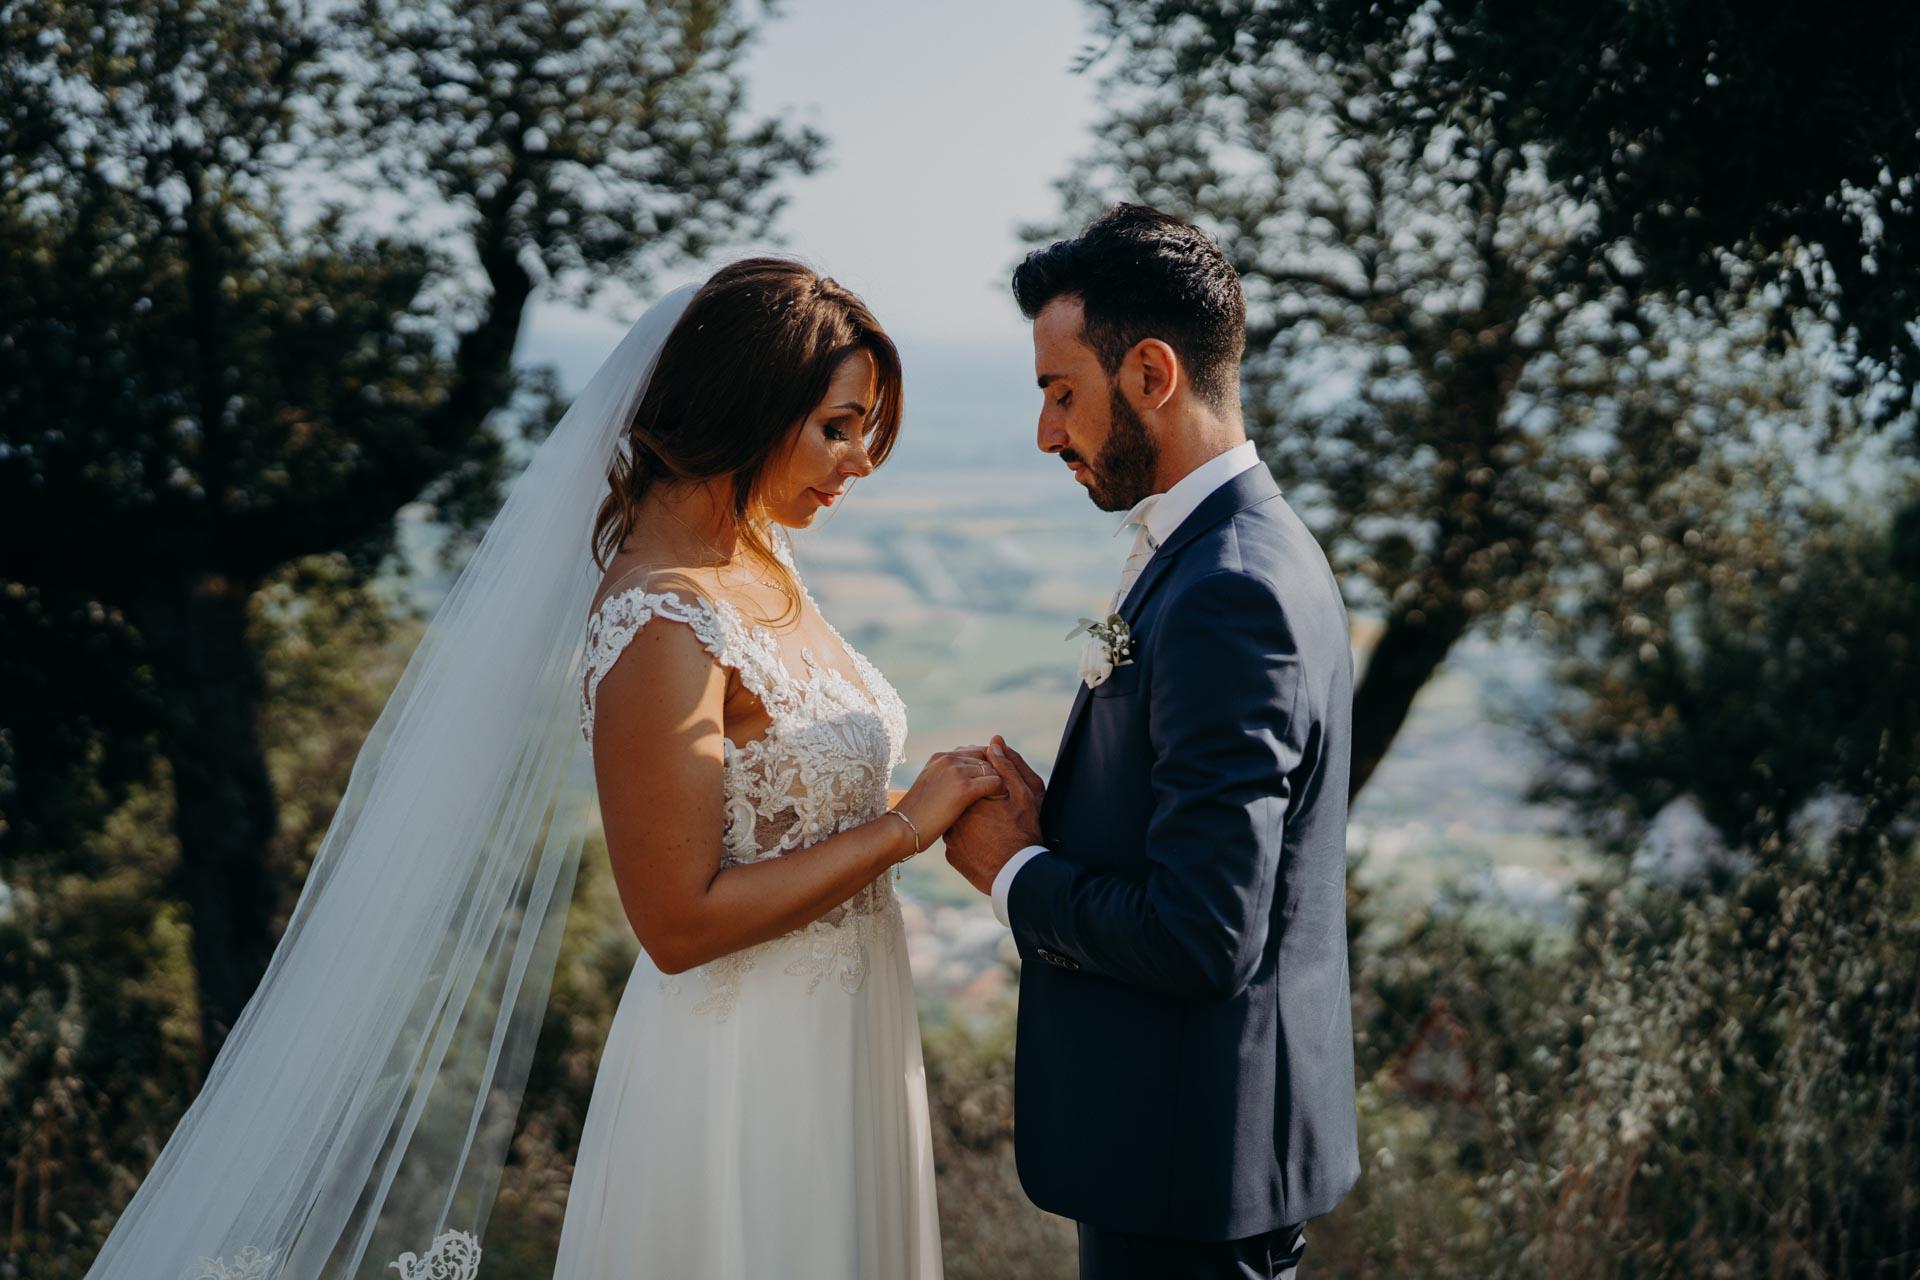 fotografo_matrimonio_toscana_poggio_tondo_64